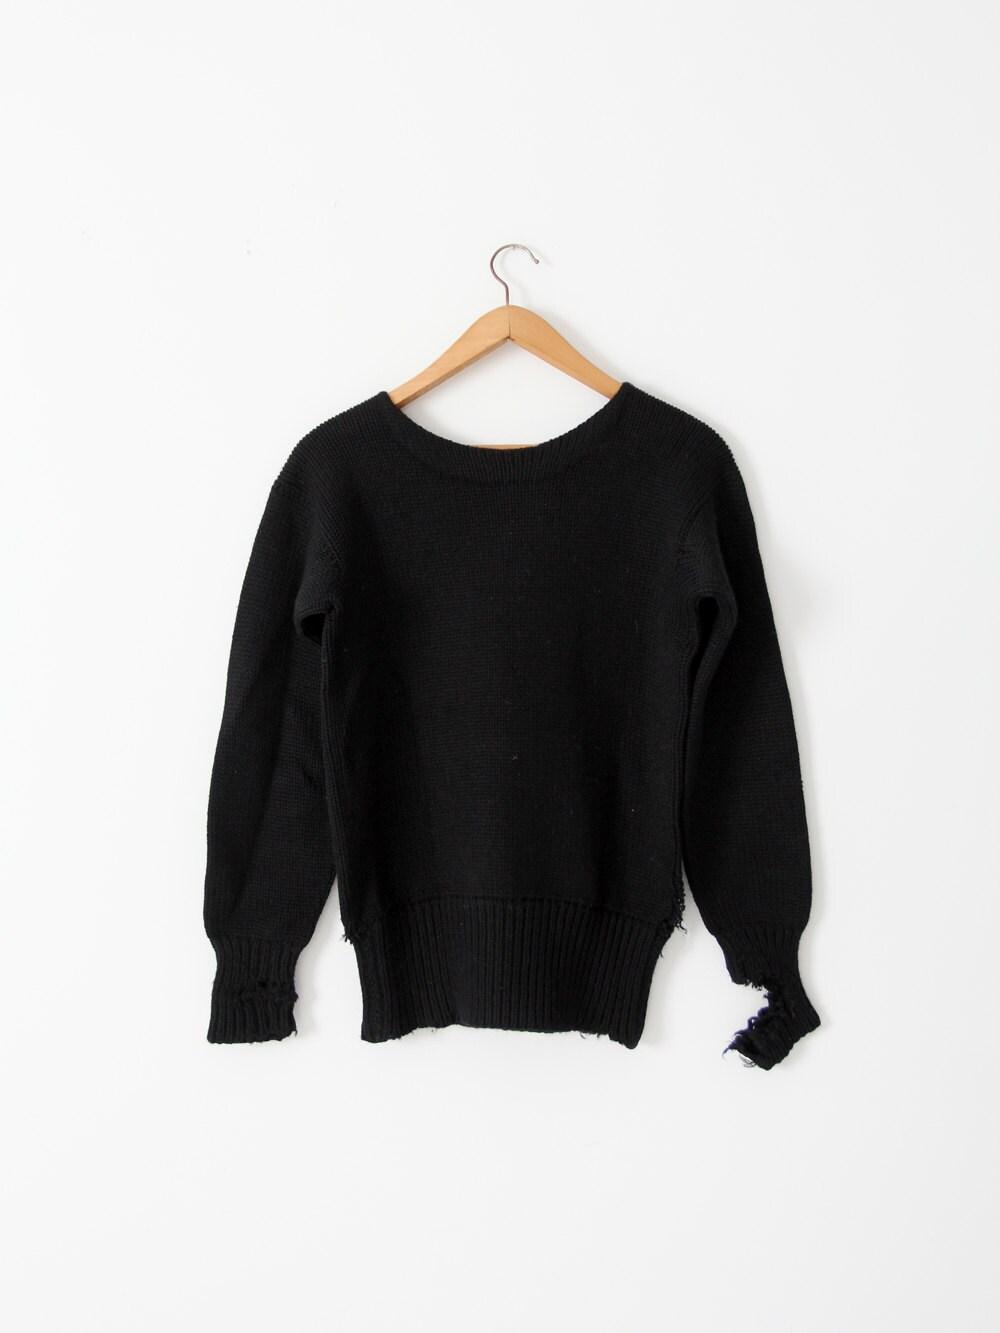 New 1930s Mens Fashion Ties Vintage 30S Black Sweater, Distressed Knit Pullover $0.00 AT vintagedancer.com